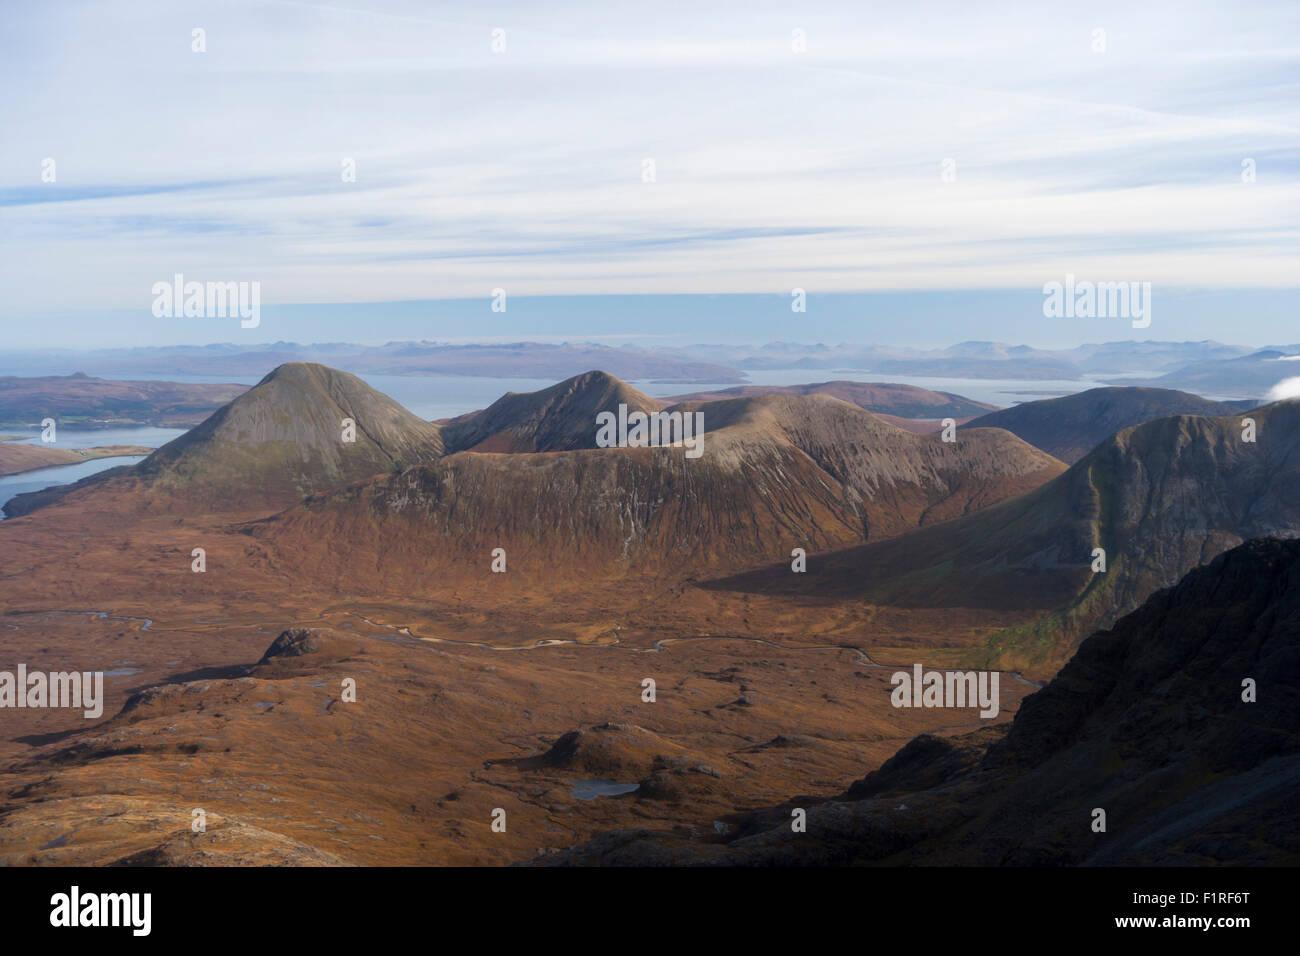 The Red Hills, Isle of Skye, Scotland, UK - Stock Image